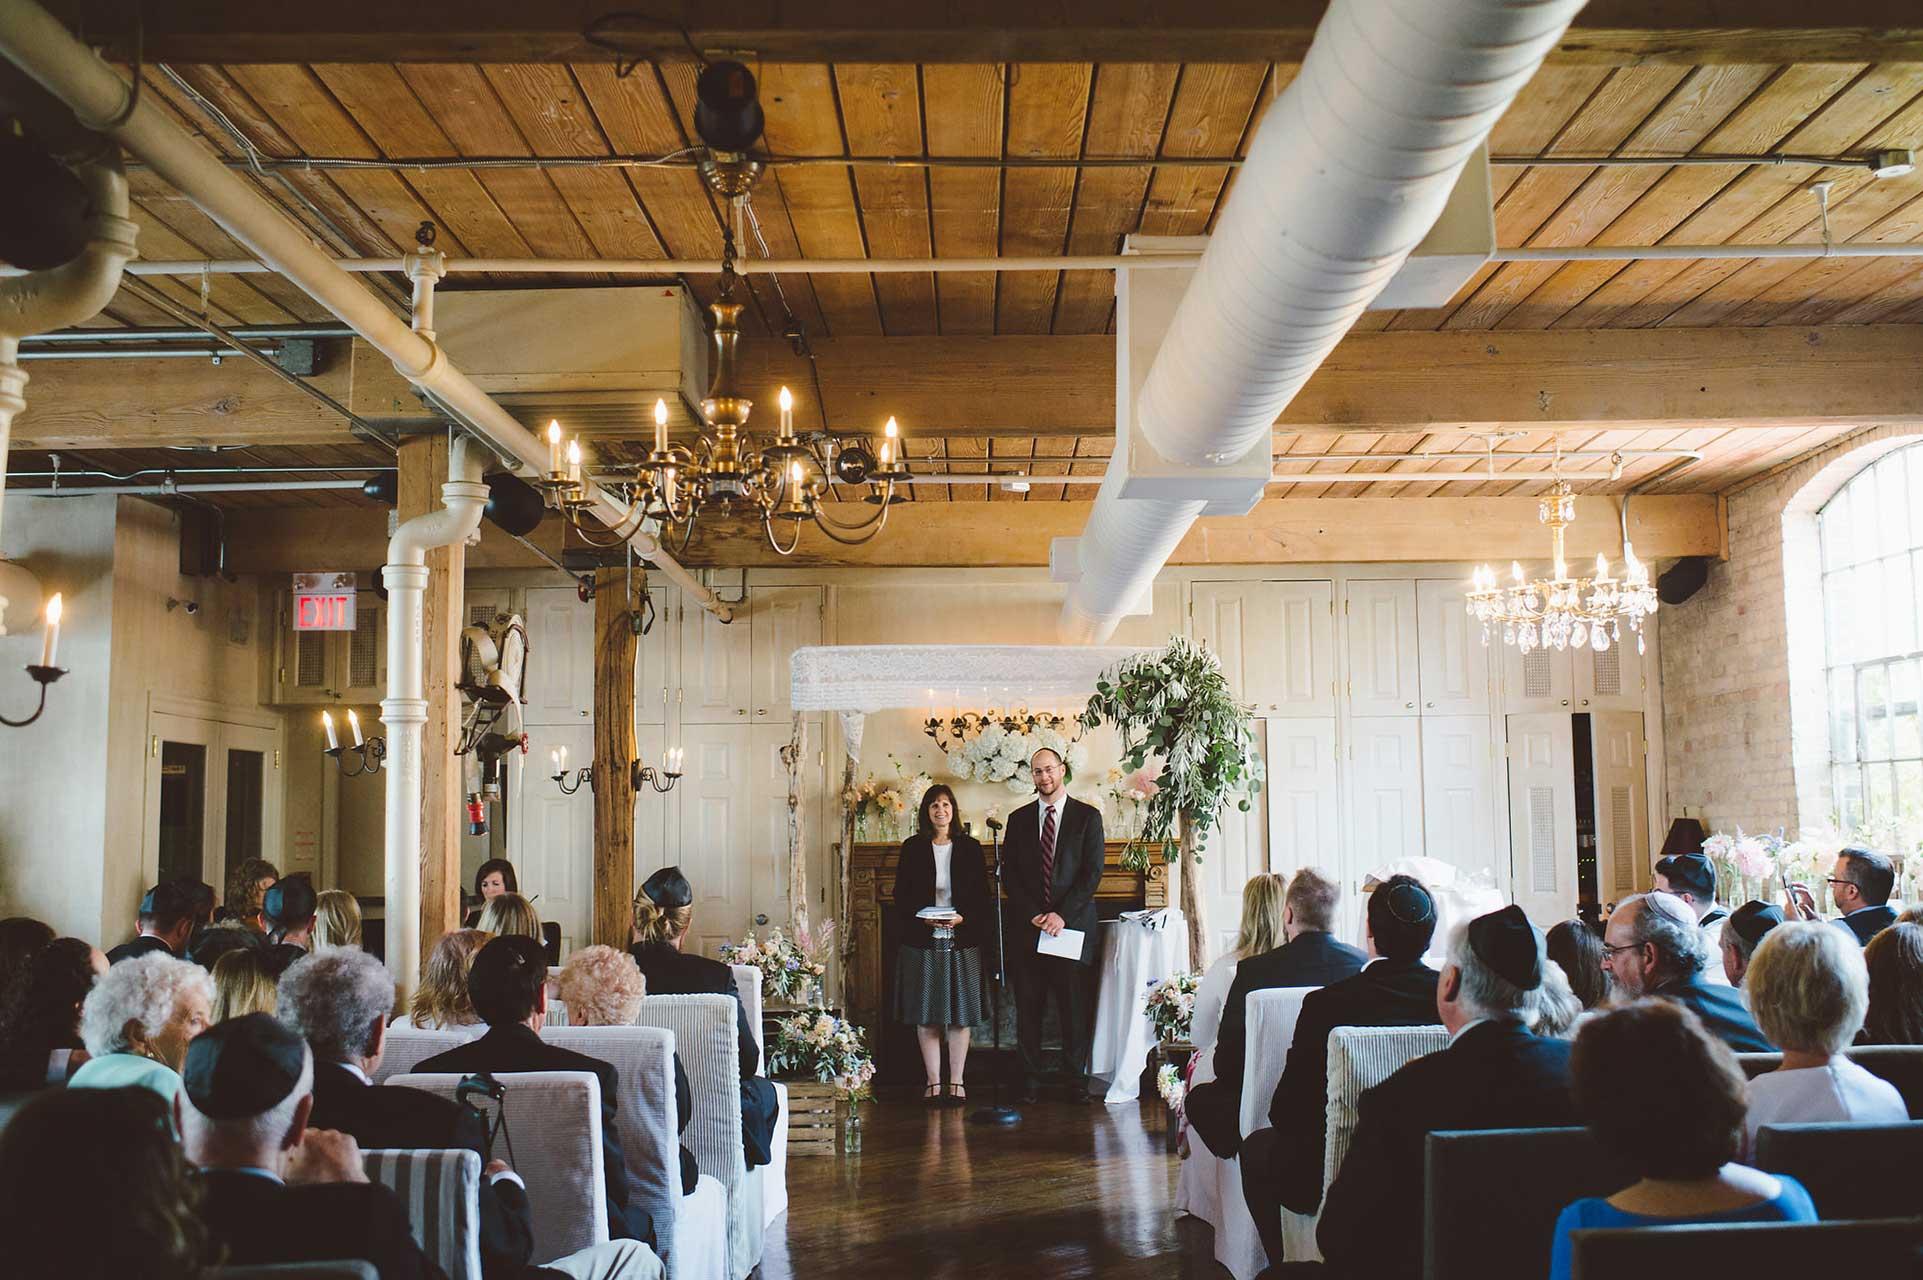 Wedding Venues Toronto - Jewish Wedding Ceremony - Chuppah